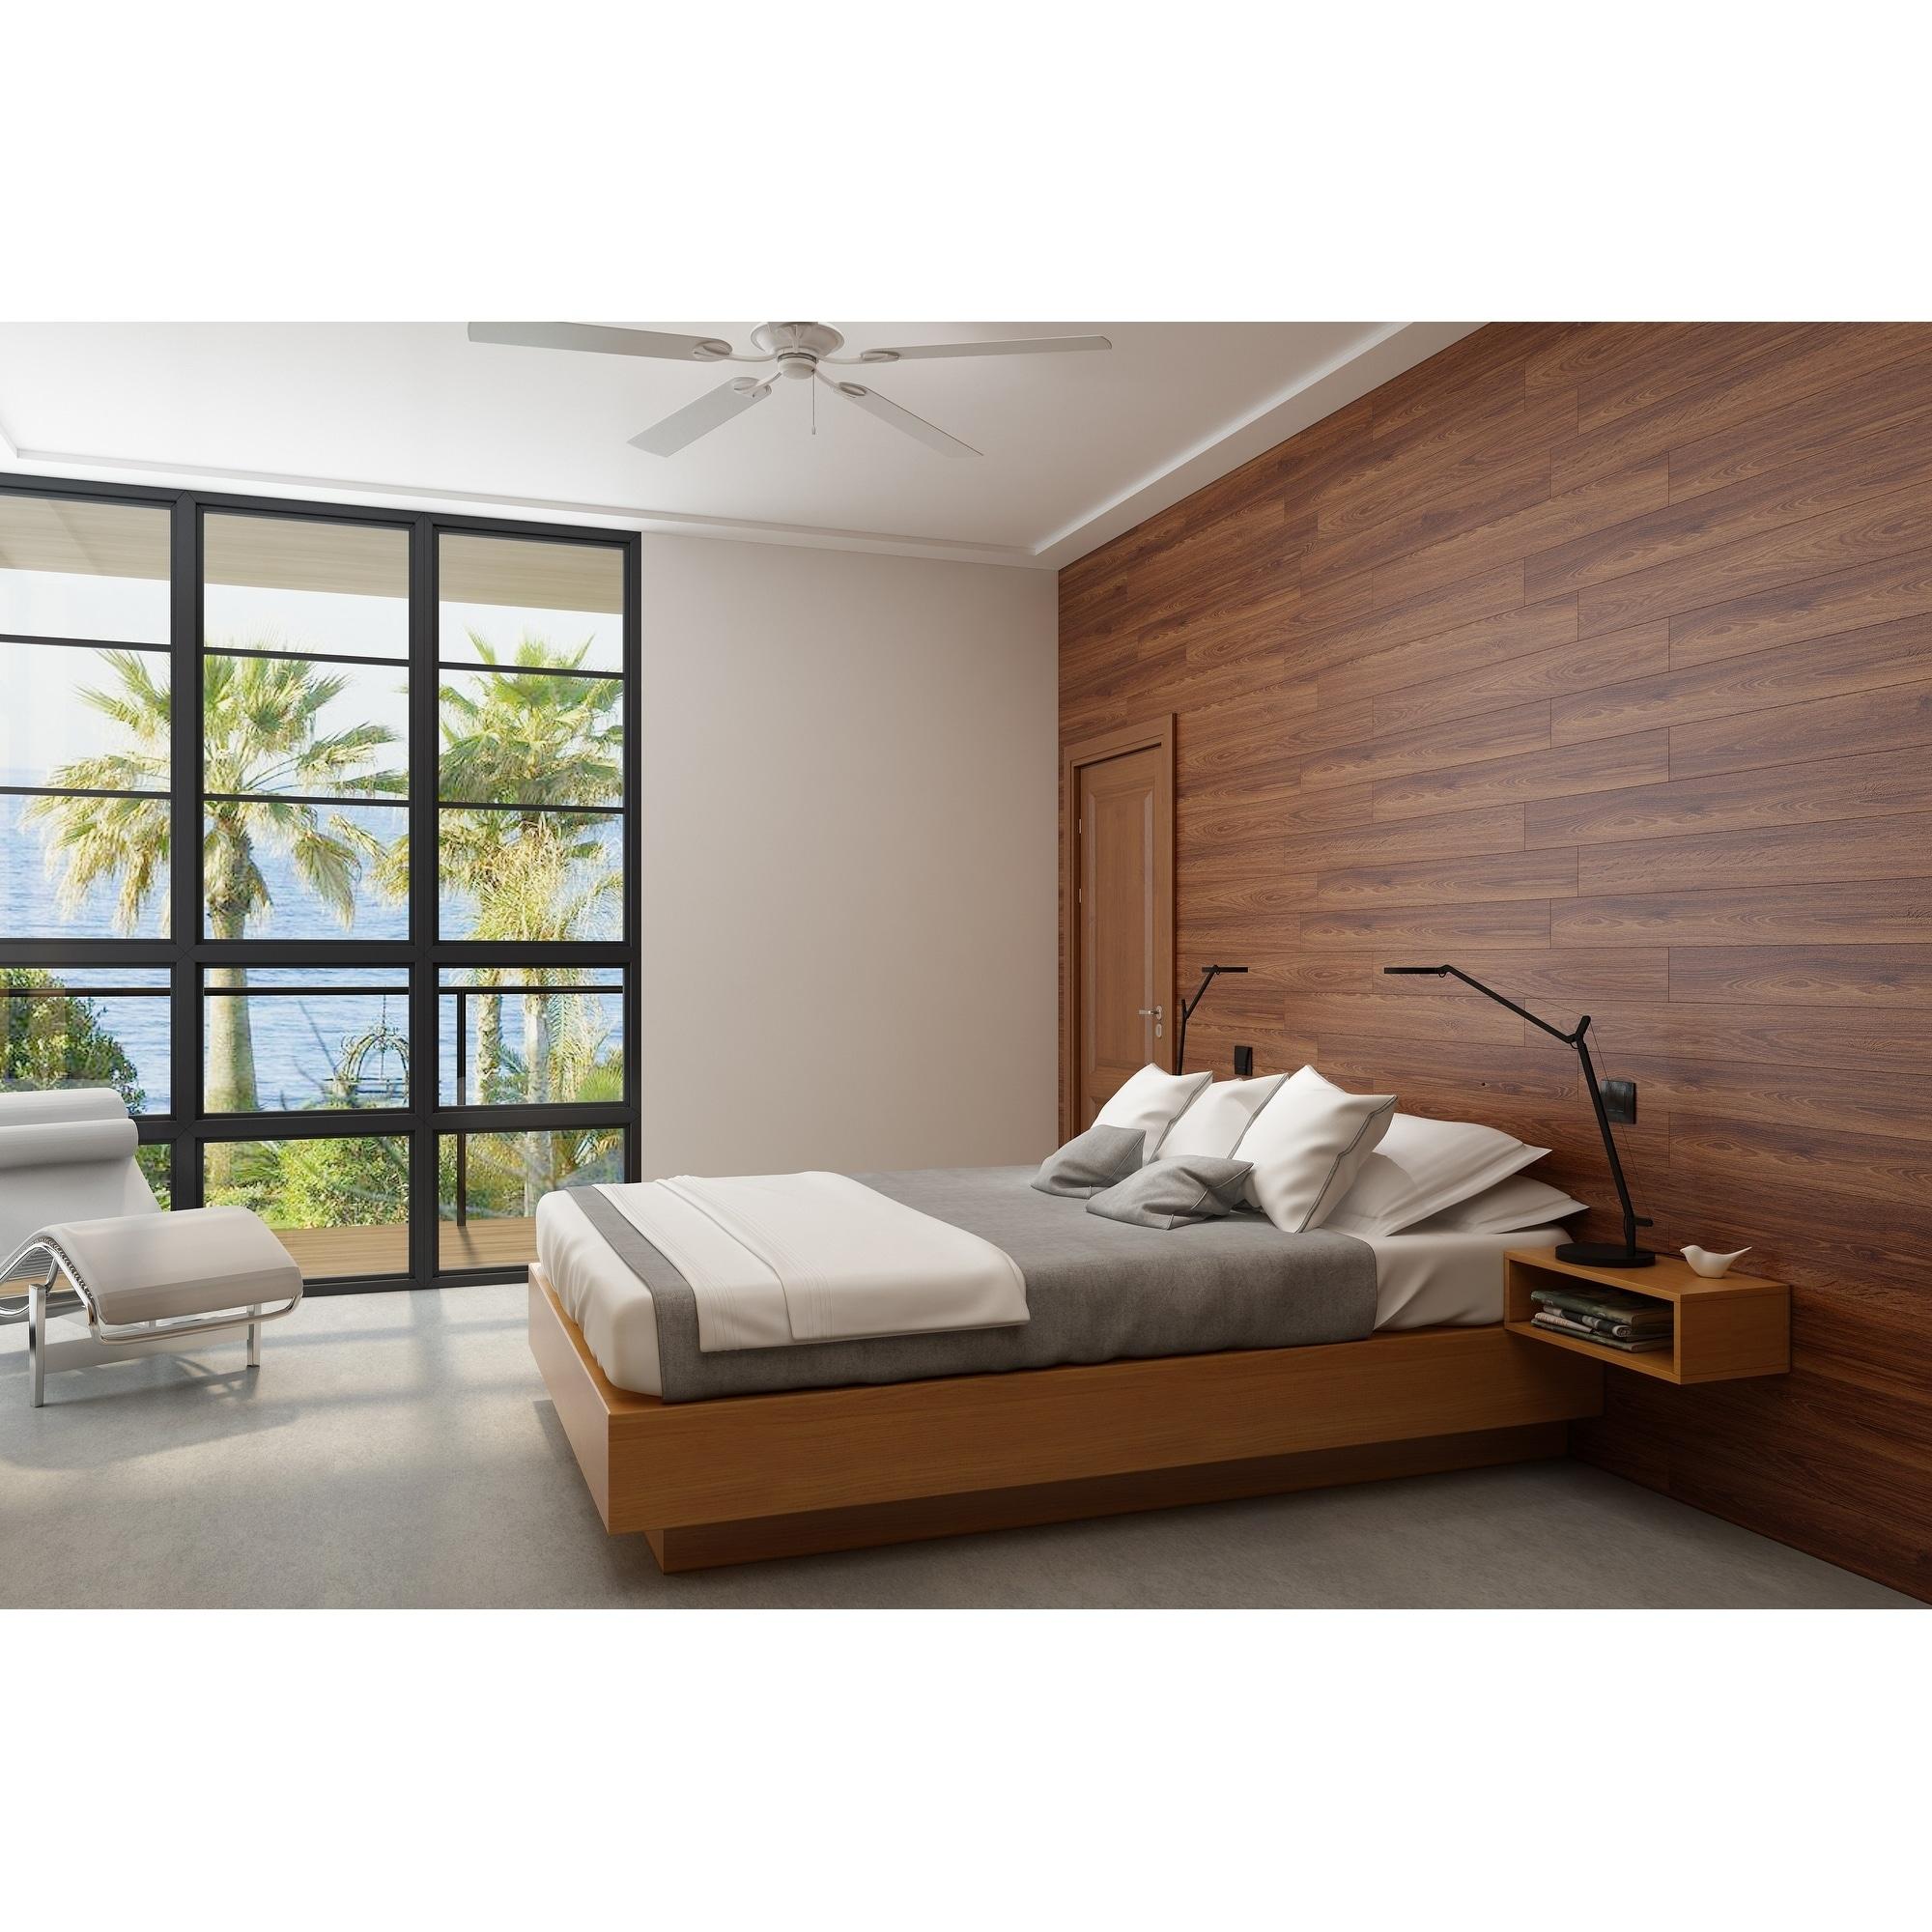 Reclaimed Rectangular Diy L And Stick Mixed Brown Wood Panels Plank Decor 10 16sqft Per Box